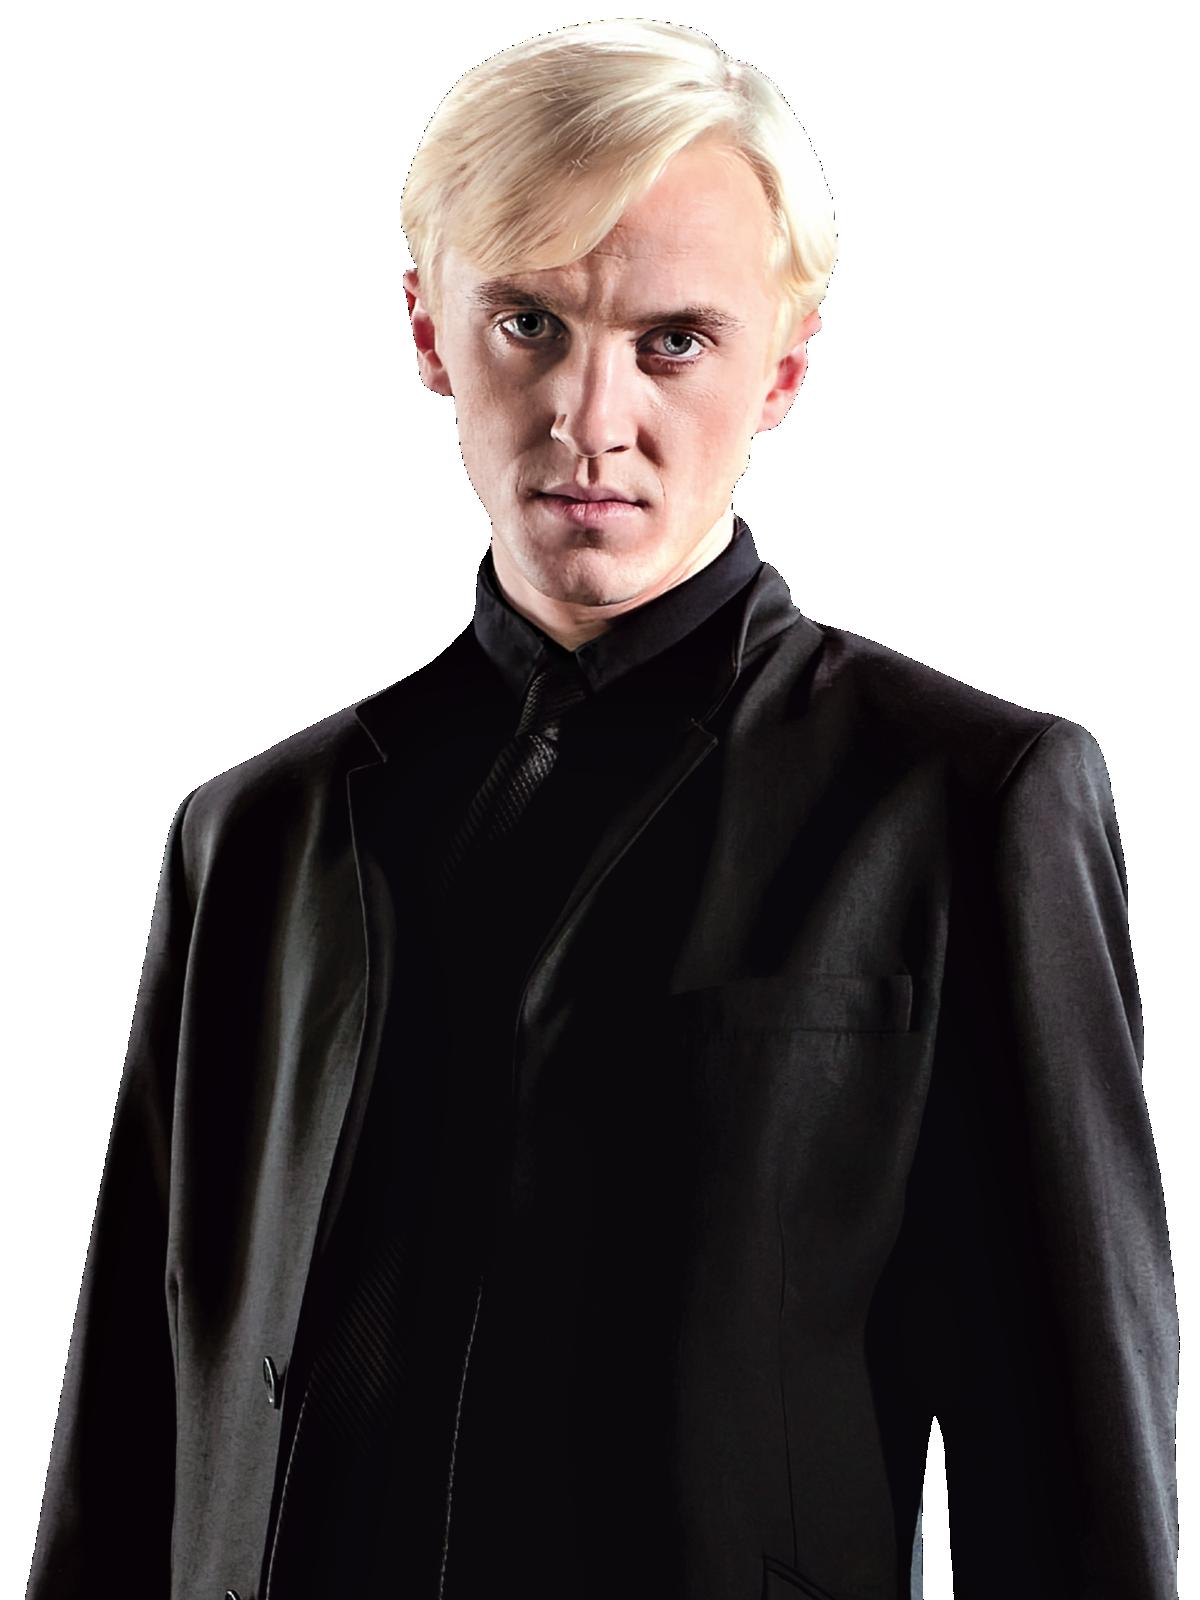 Draco Malfoy Harry Potter Wiki Fandom The school, which presumably takes mainly. draco malfoy harry potter wiki fandom